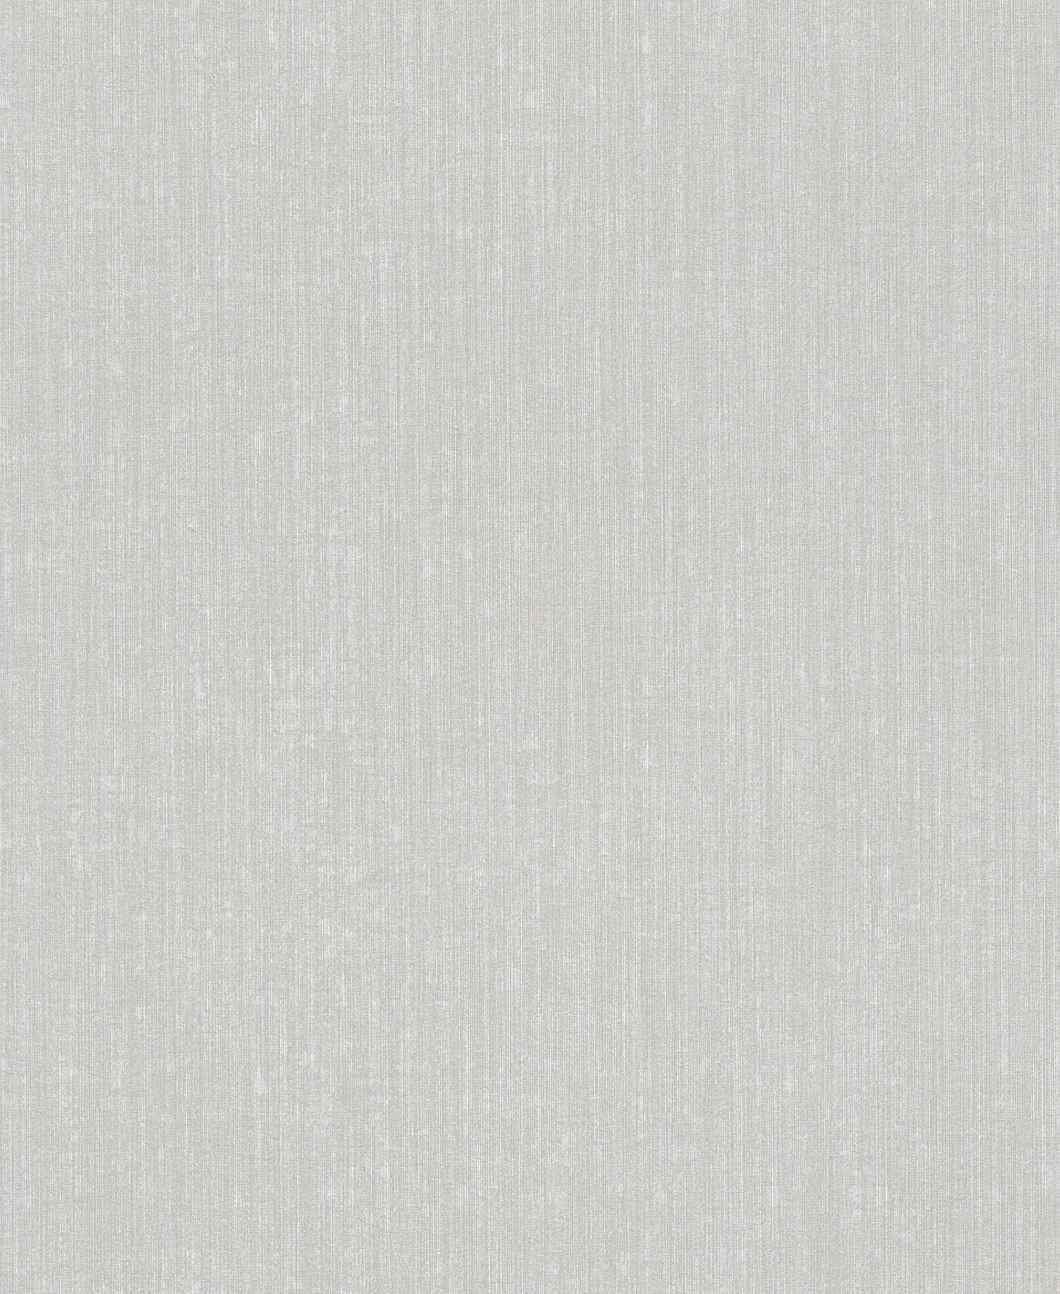 Обои Aquarelle Stella 074160, интернет магазин Волео